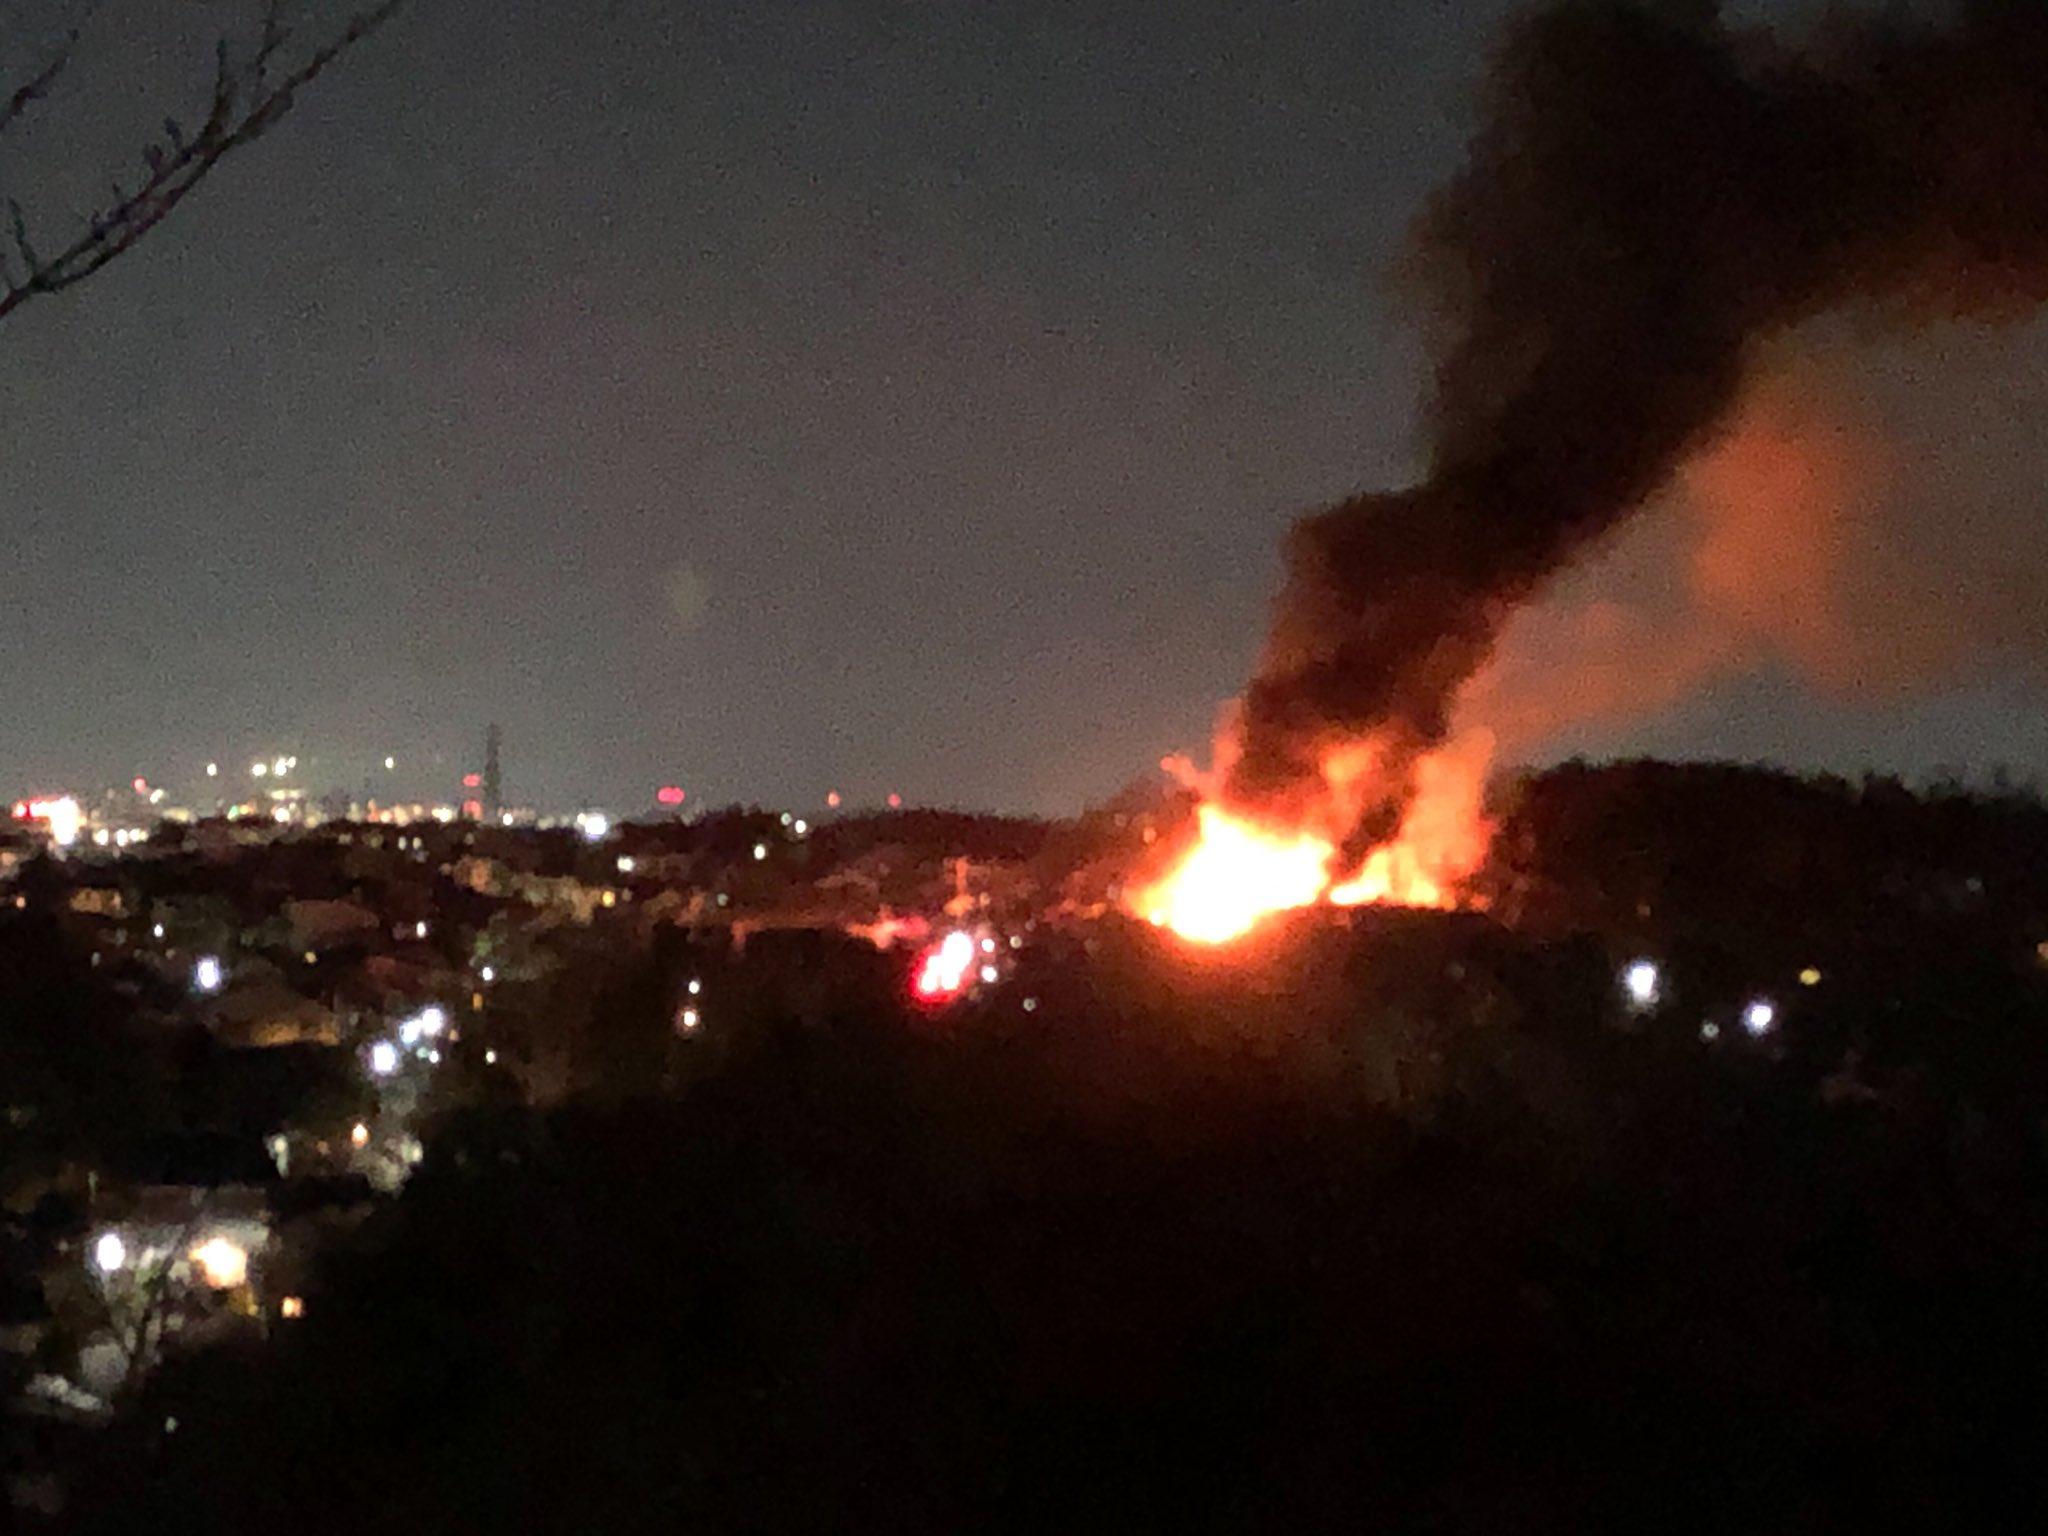 鎌倉 火事